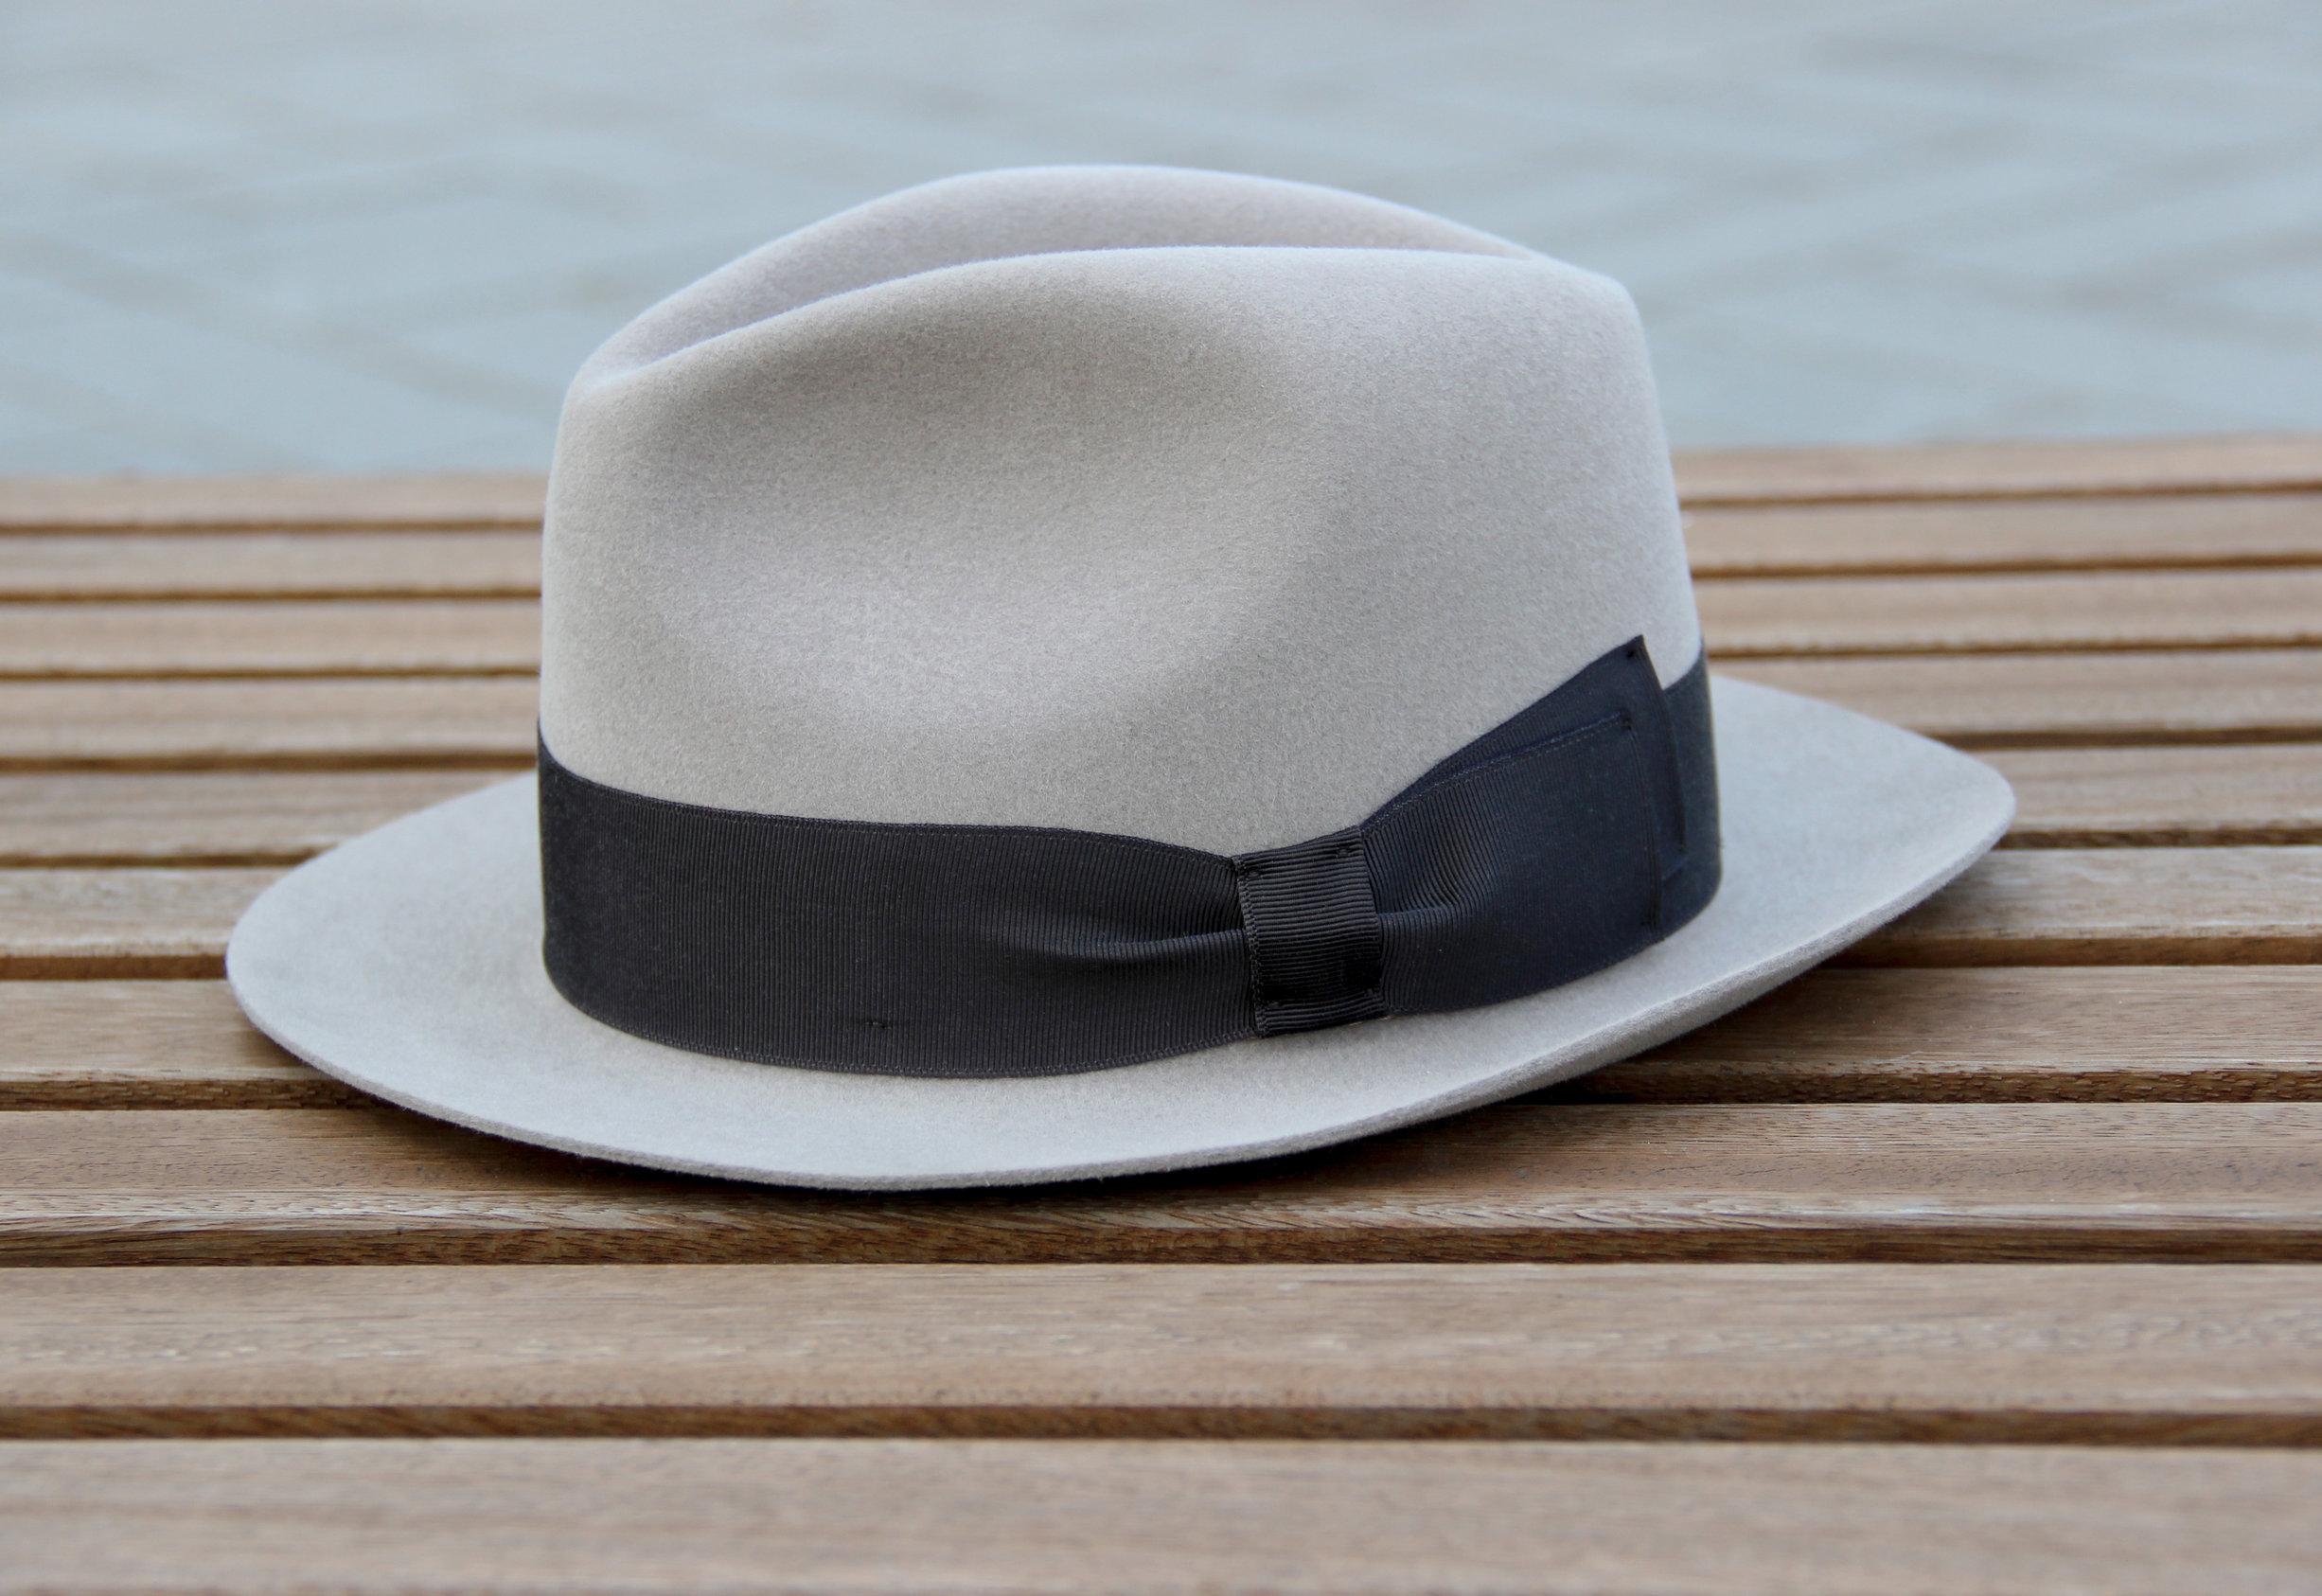 MAD MEN - Don Draper Style Stingy Brim Fedora Hat by LONG STORY SHORT